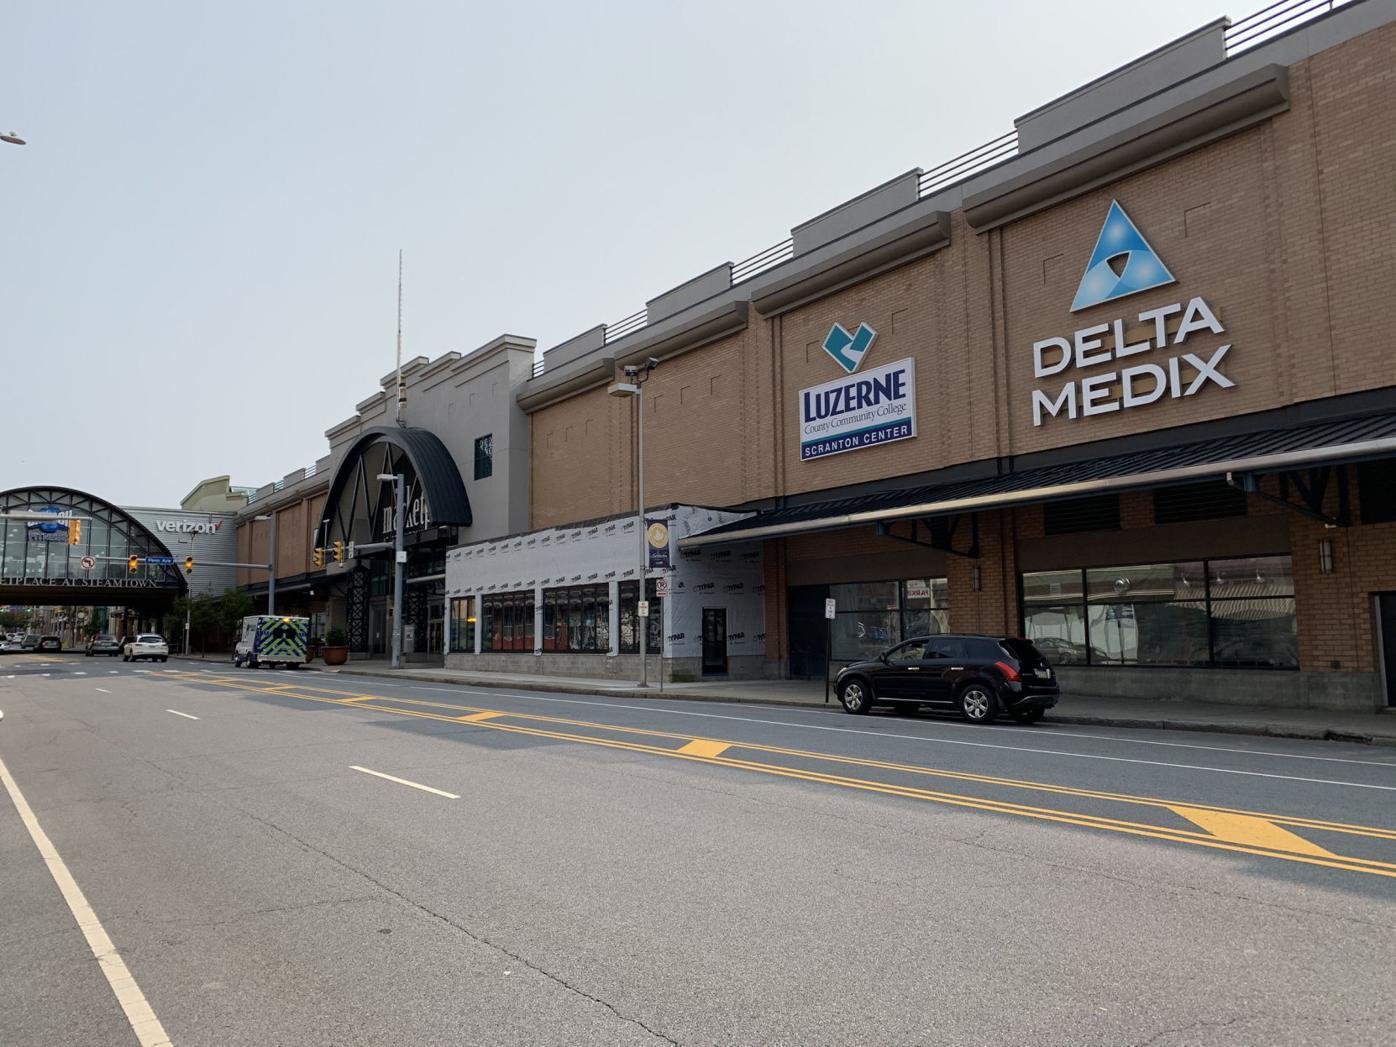 Delta Medix sues Geisinger over two sites in Scranton